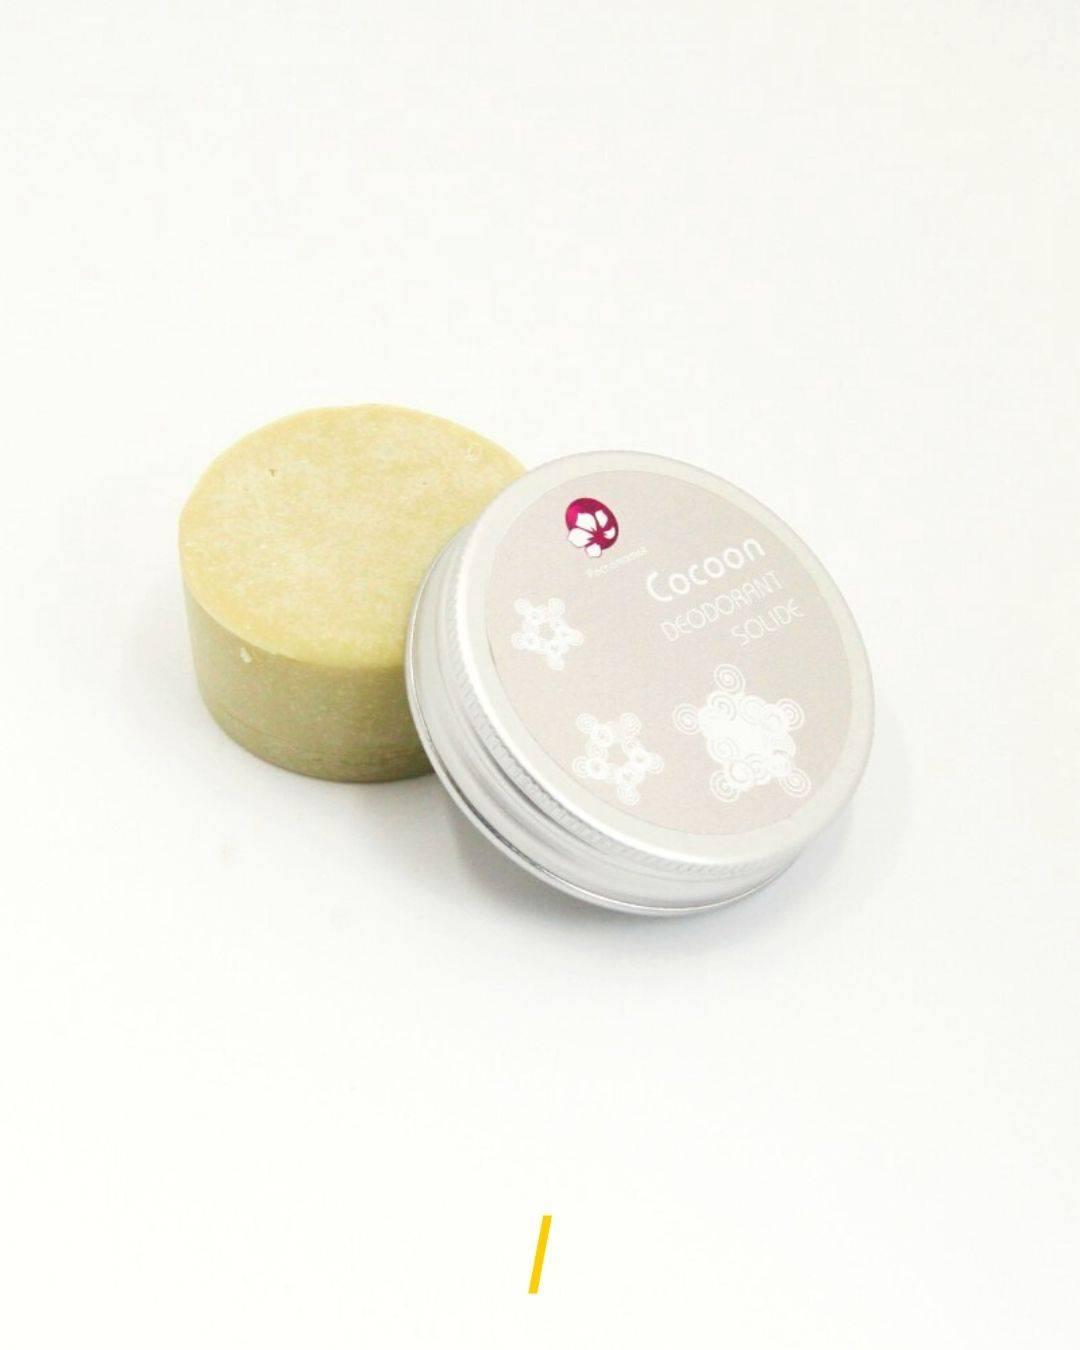 Le deodorant solide Cocoon - Pachamamai